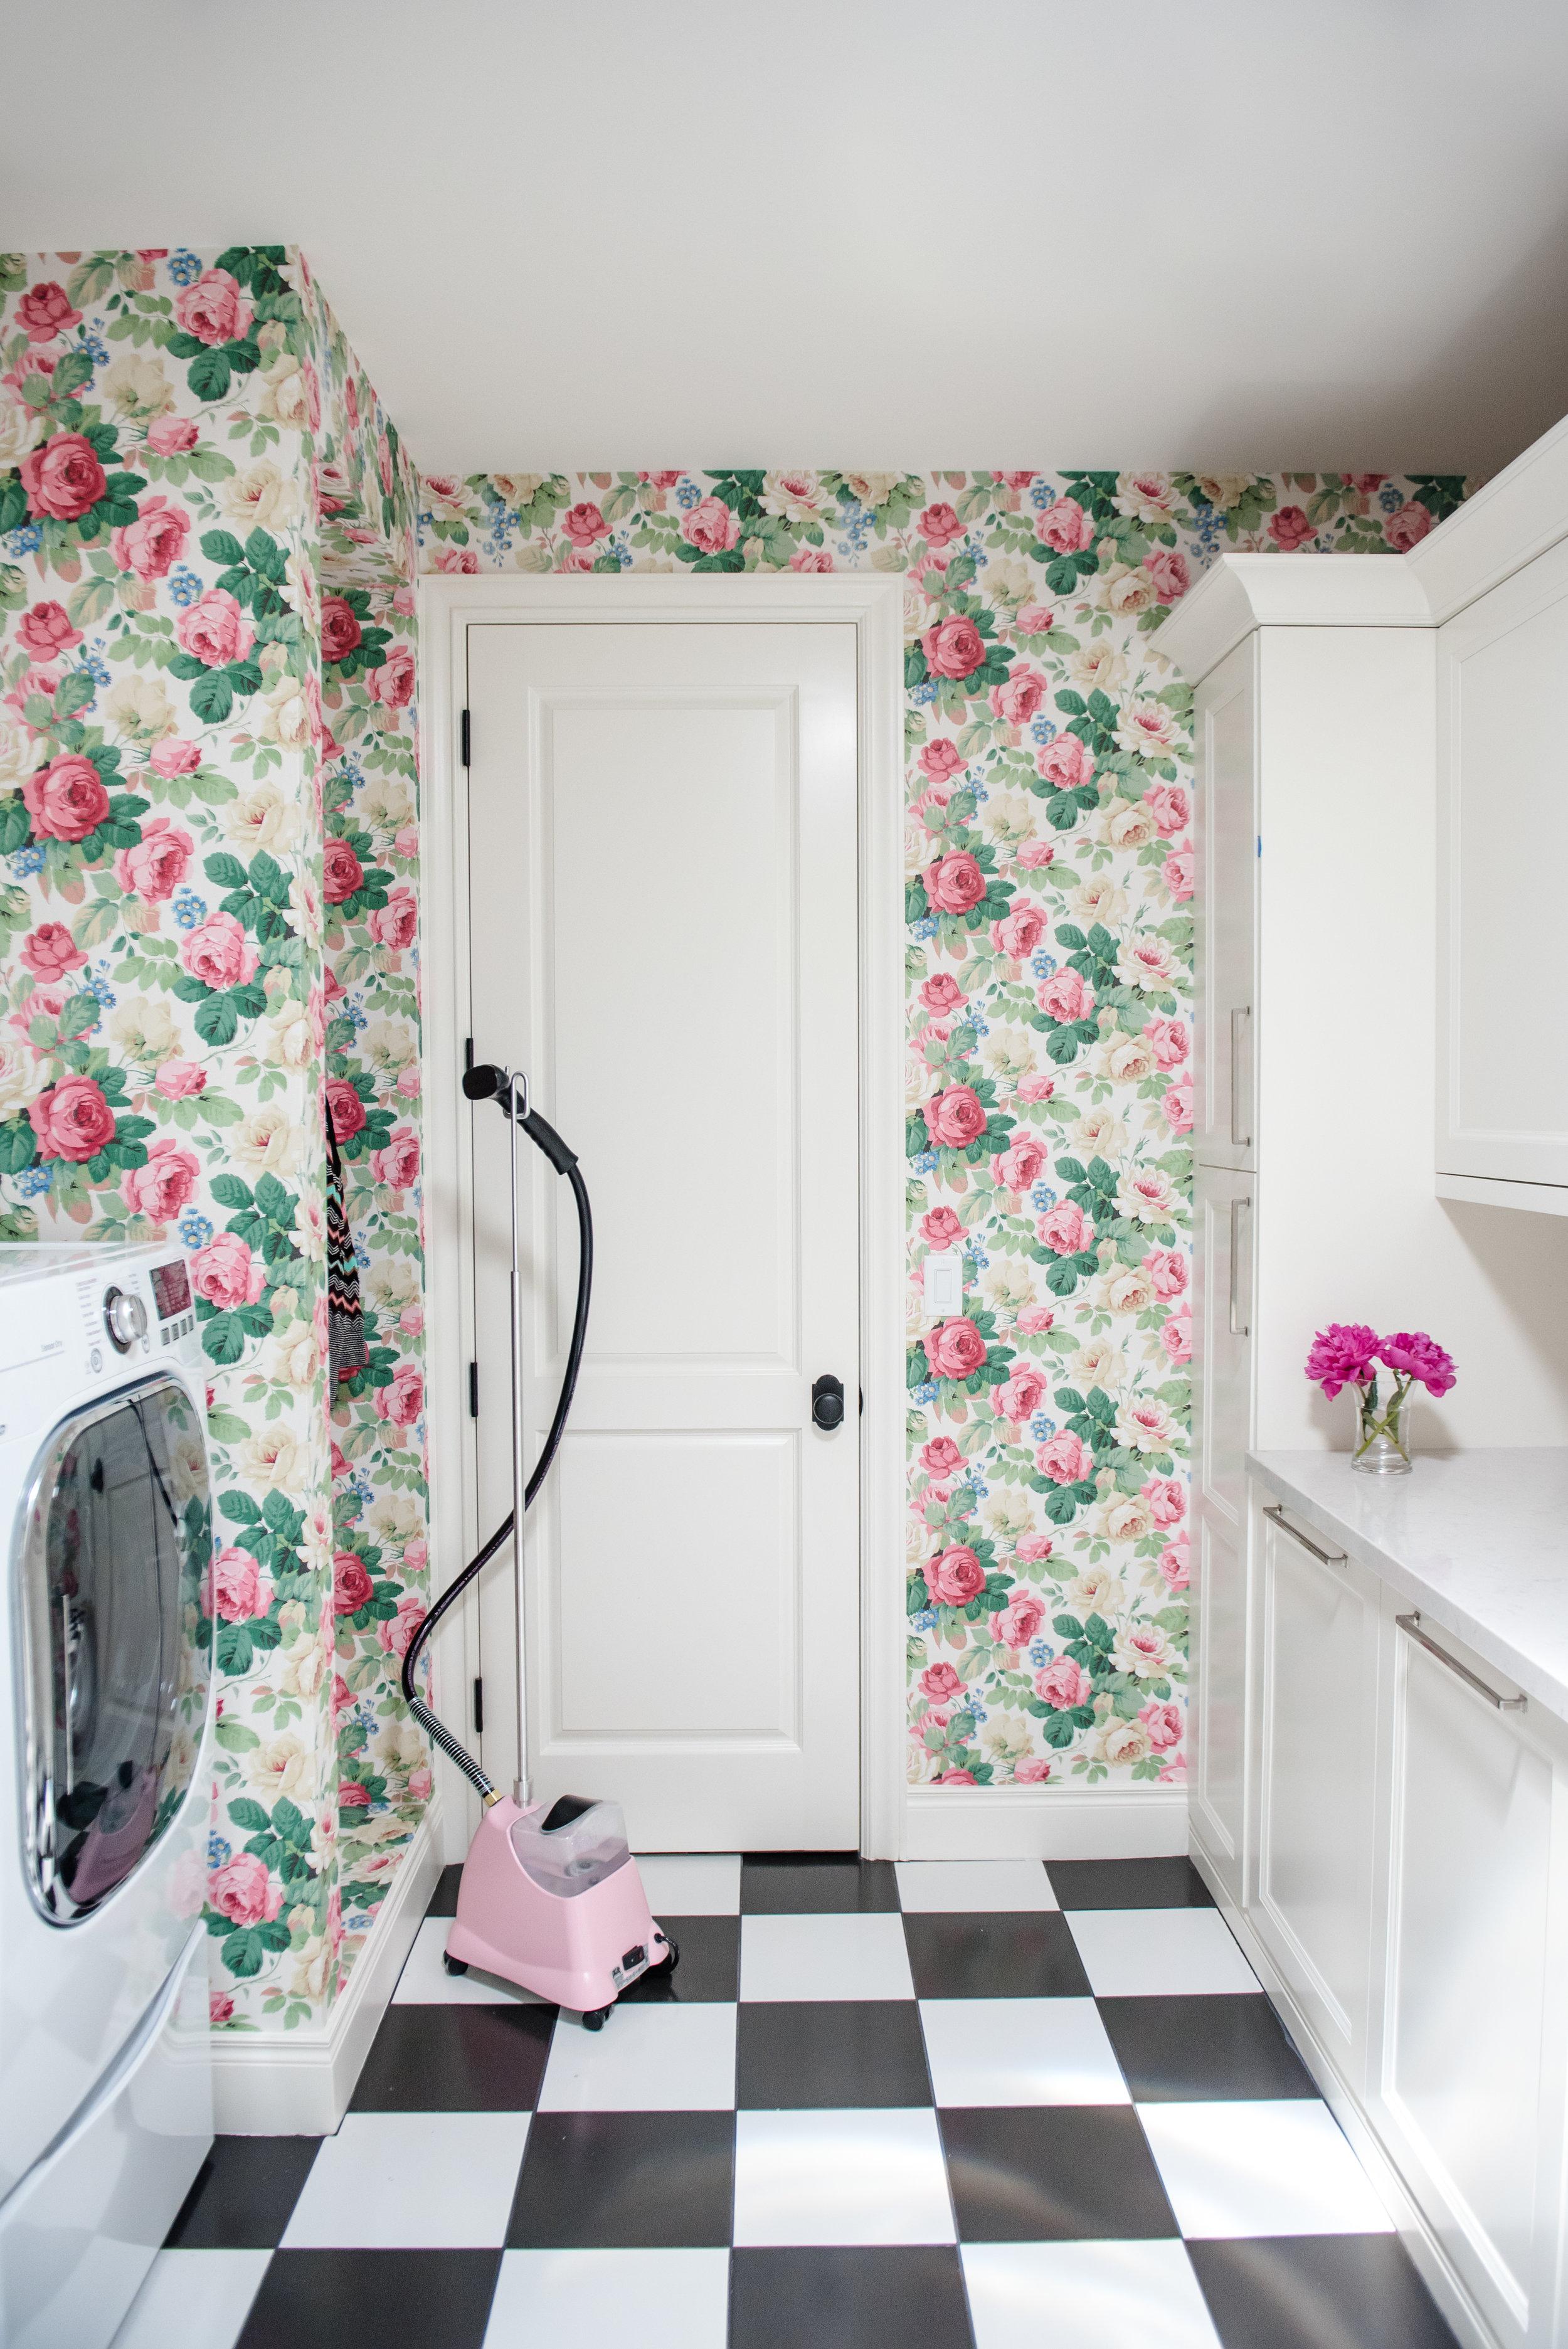 43+Laundry+Checkerboard+Floral+BlackandWhite+Feminine+Wallpaper.jpg